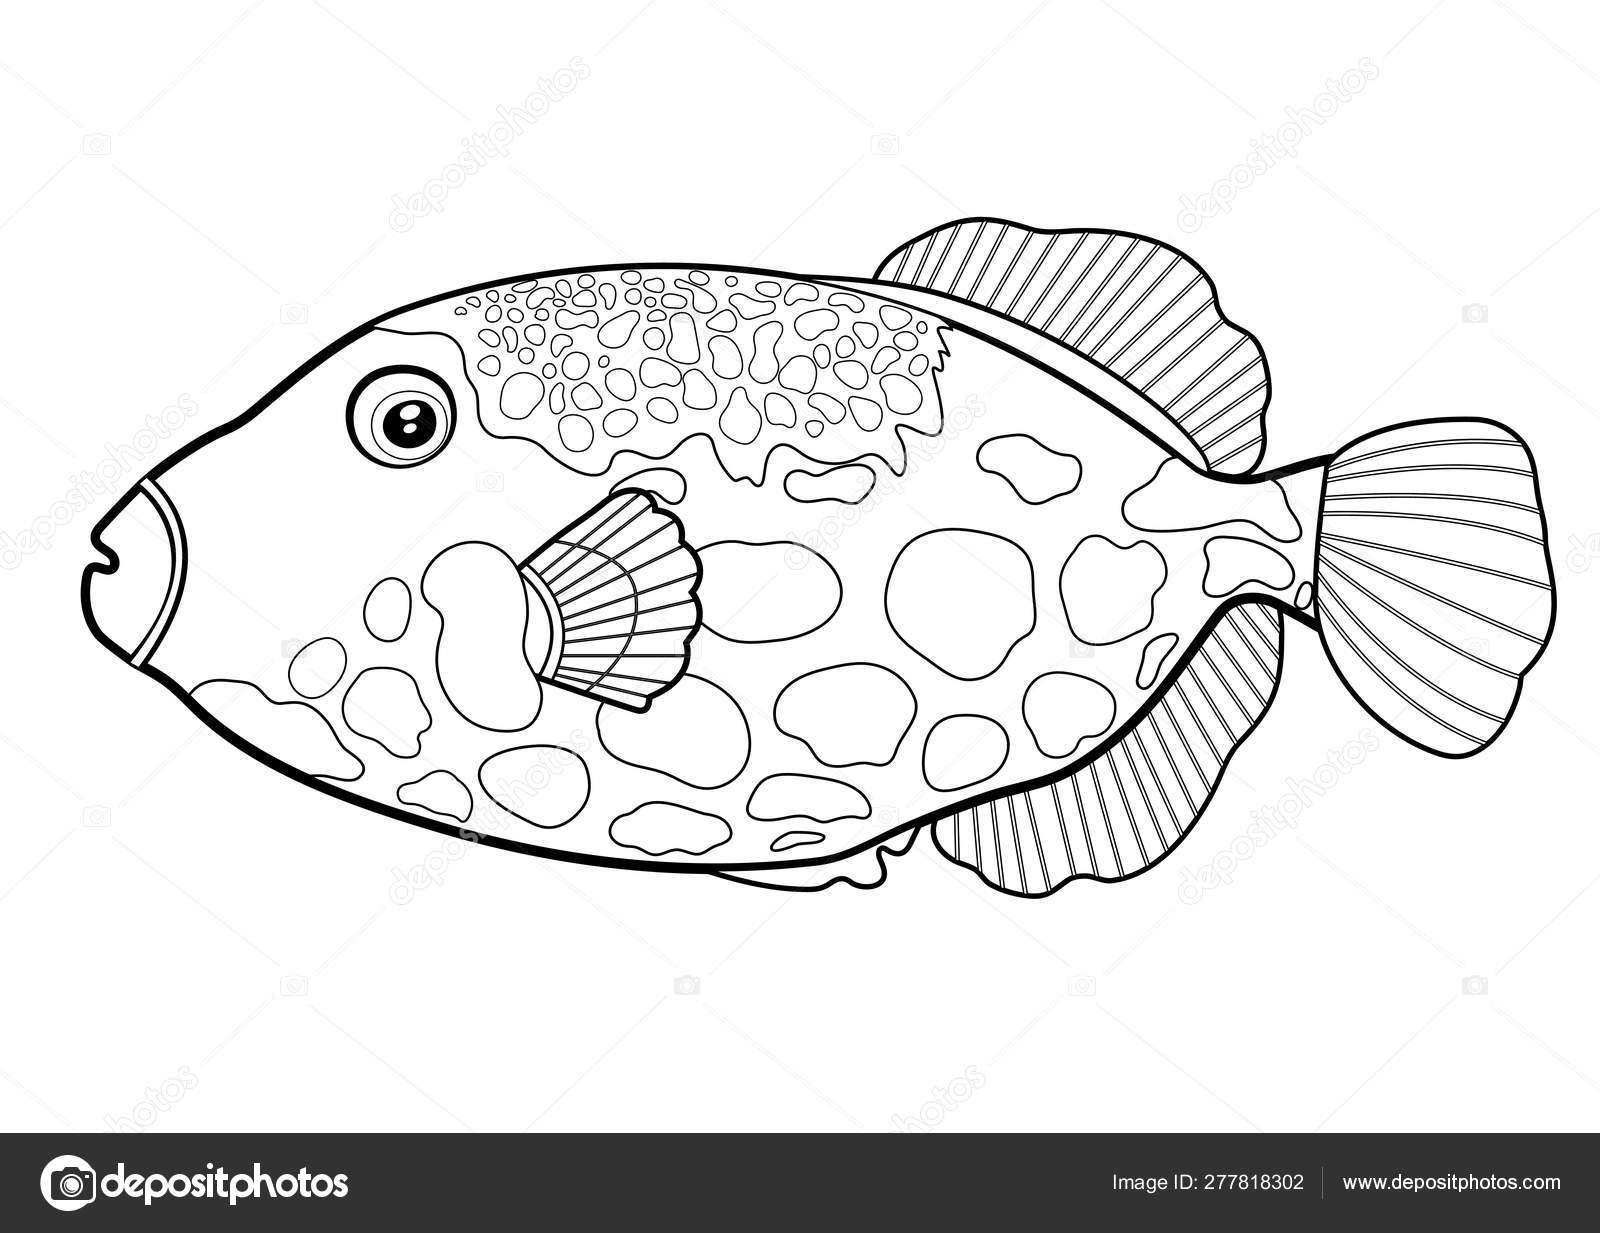 - Triggerfish Fish Clown, Line Silhouette Cartoon Hand Drawn Sea